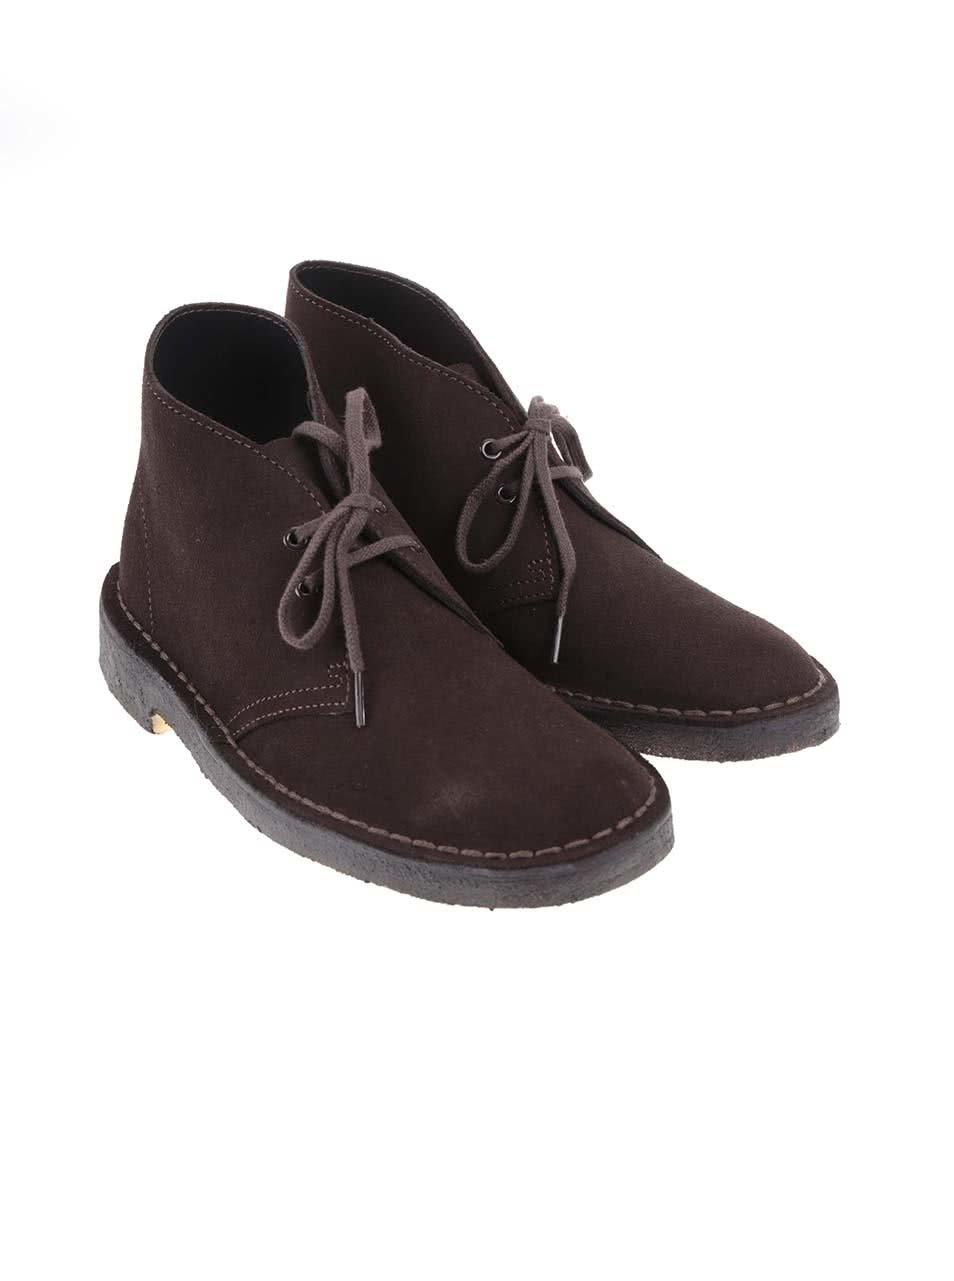 Hnedé dámske kožené členkové topánky Clarks Desert Boot ... 09c8142eac9